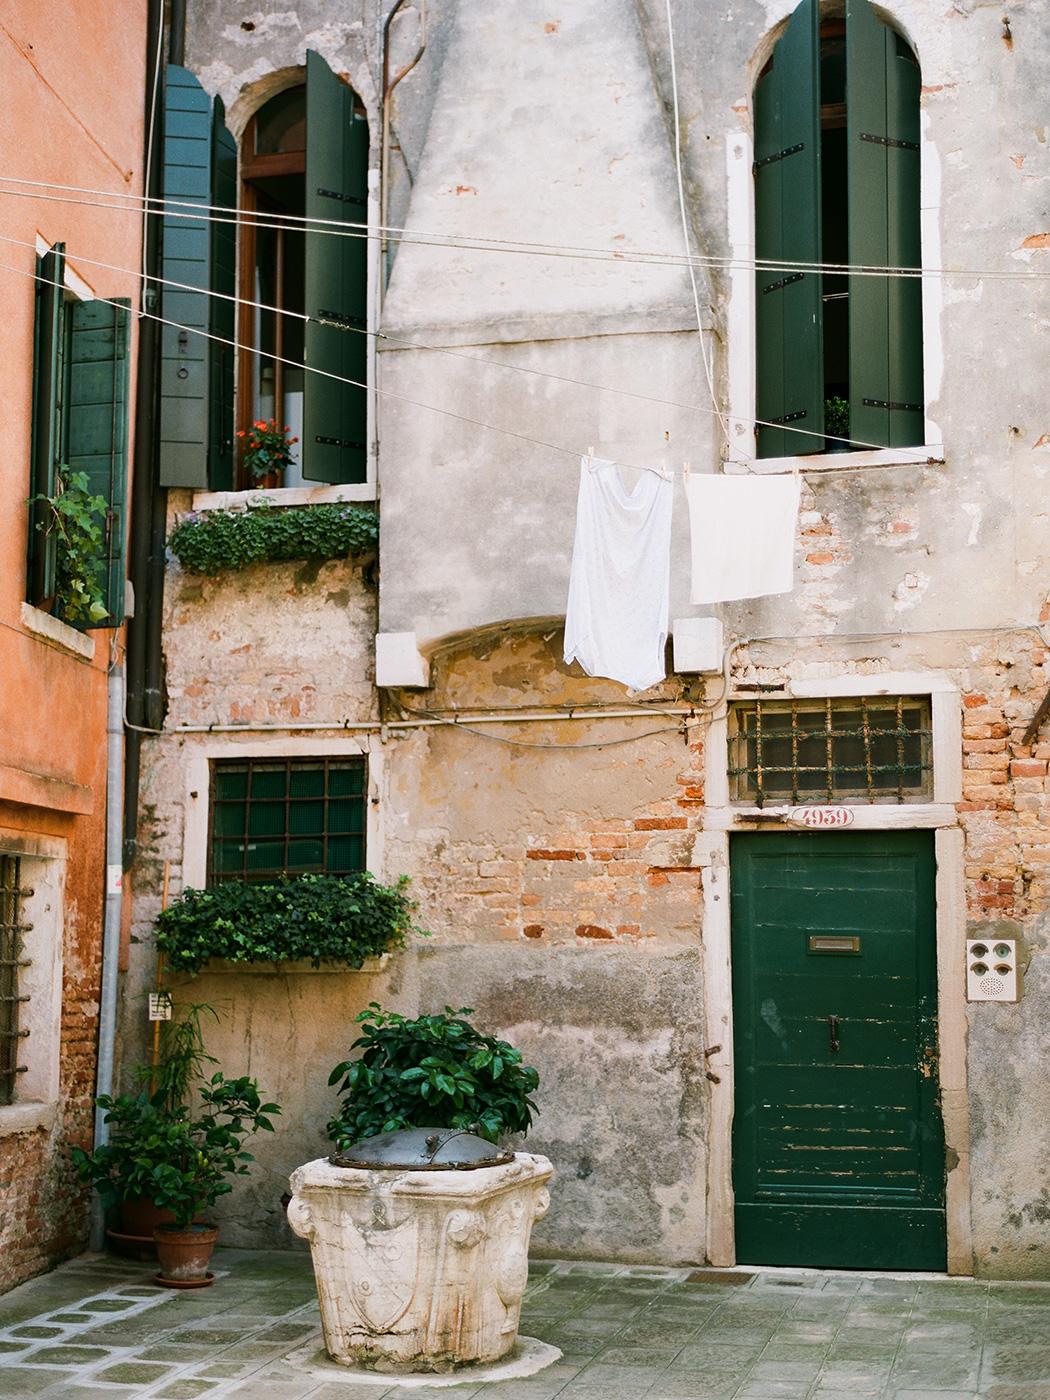 062S&E_Venice.jpg